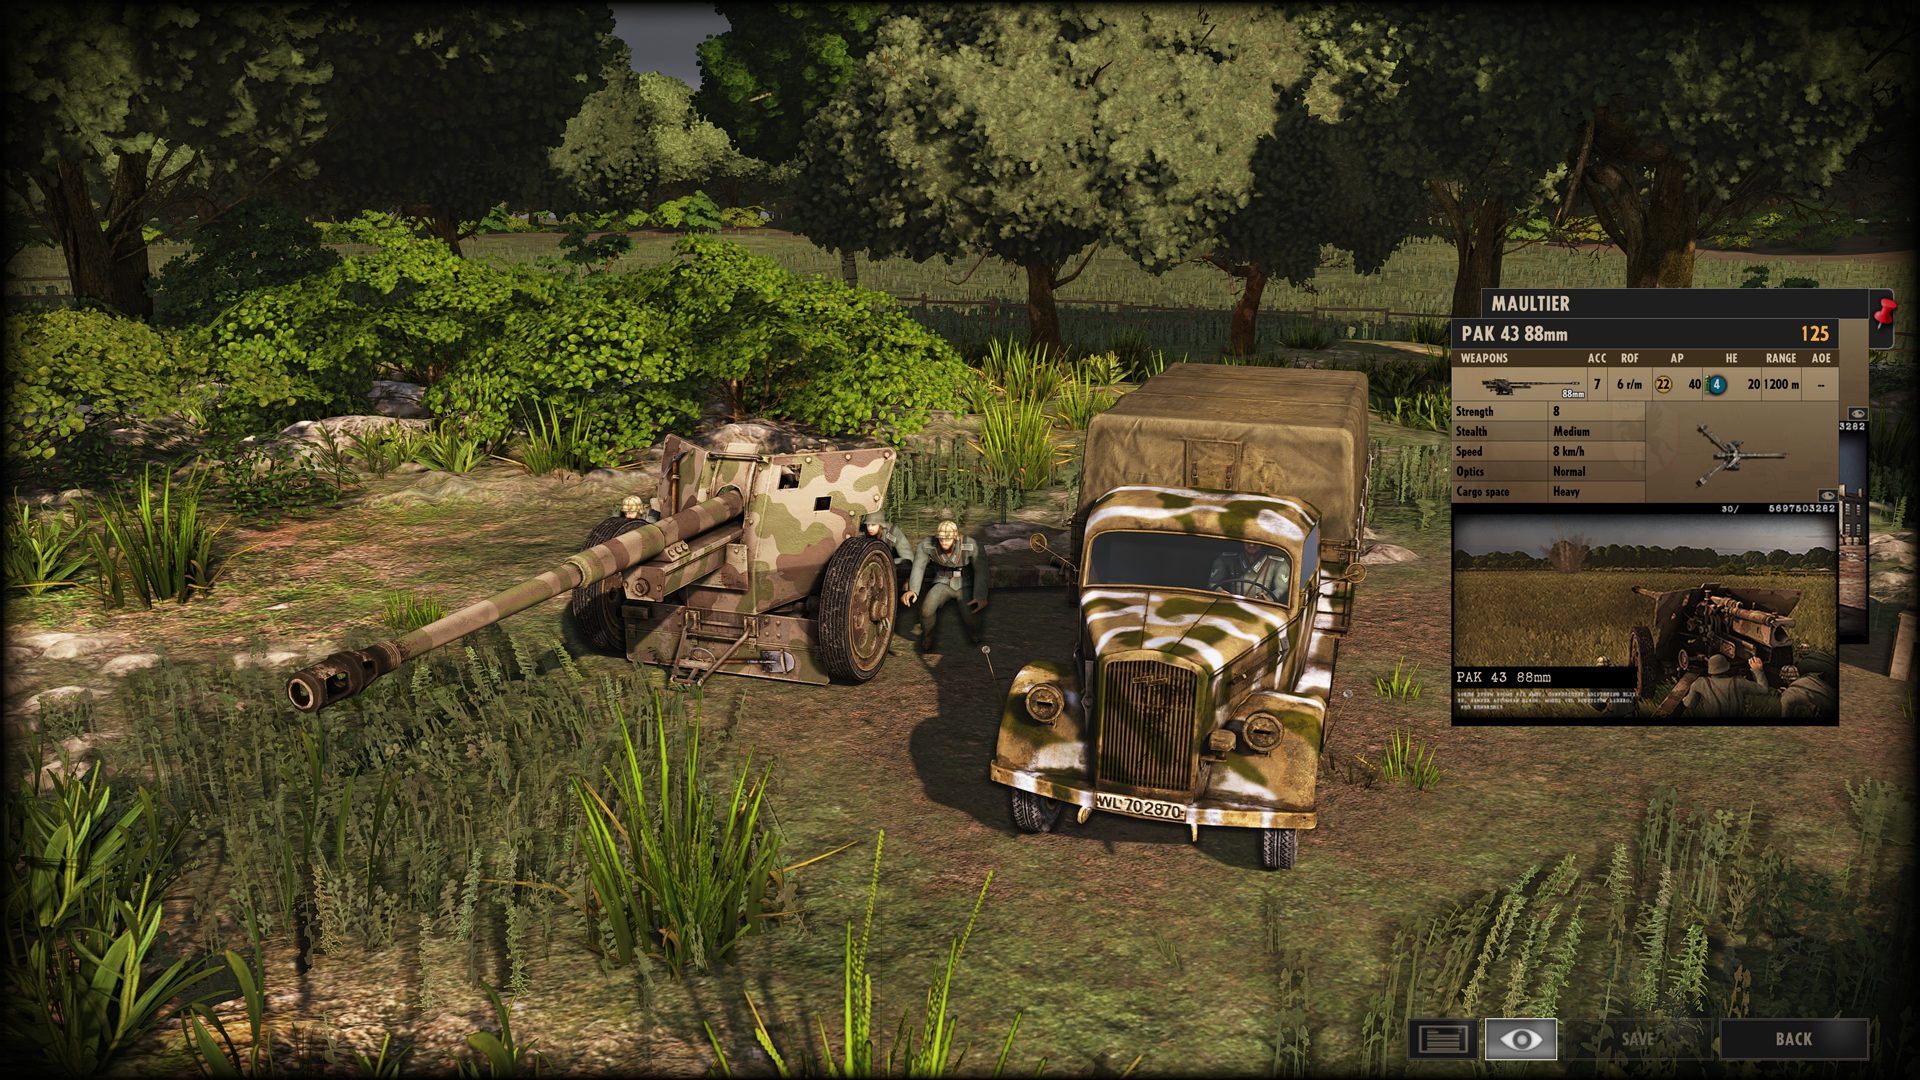 Steel Division: Normandy 44 - Anti-tank gameplay AT Gun